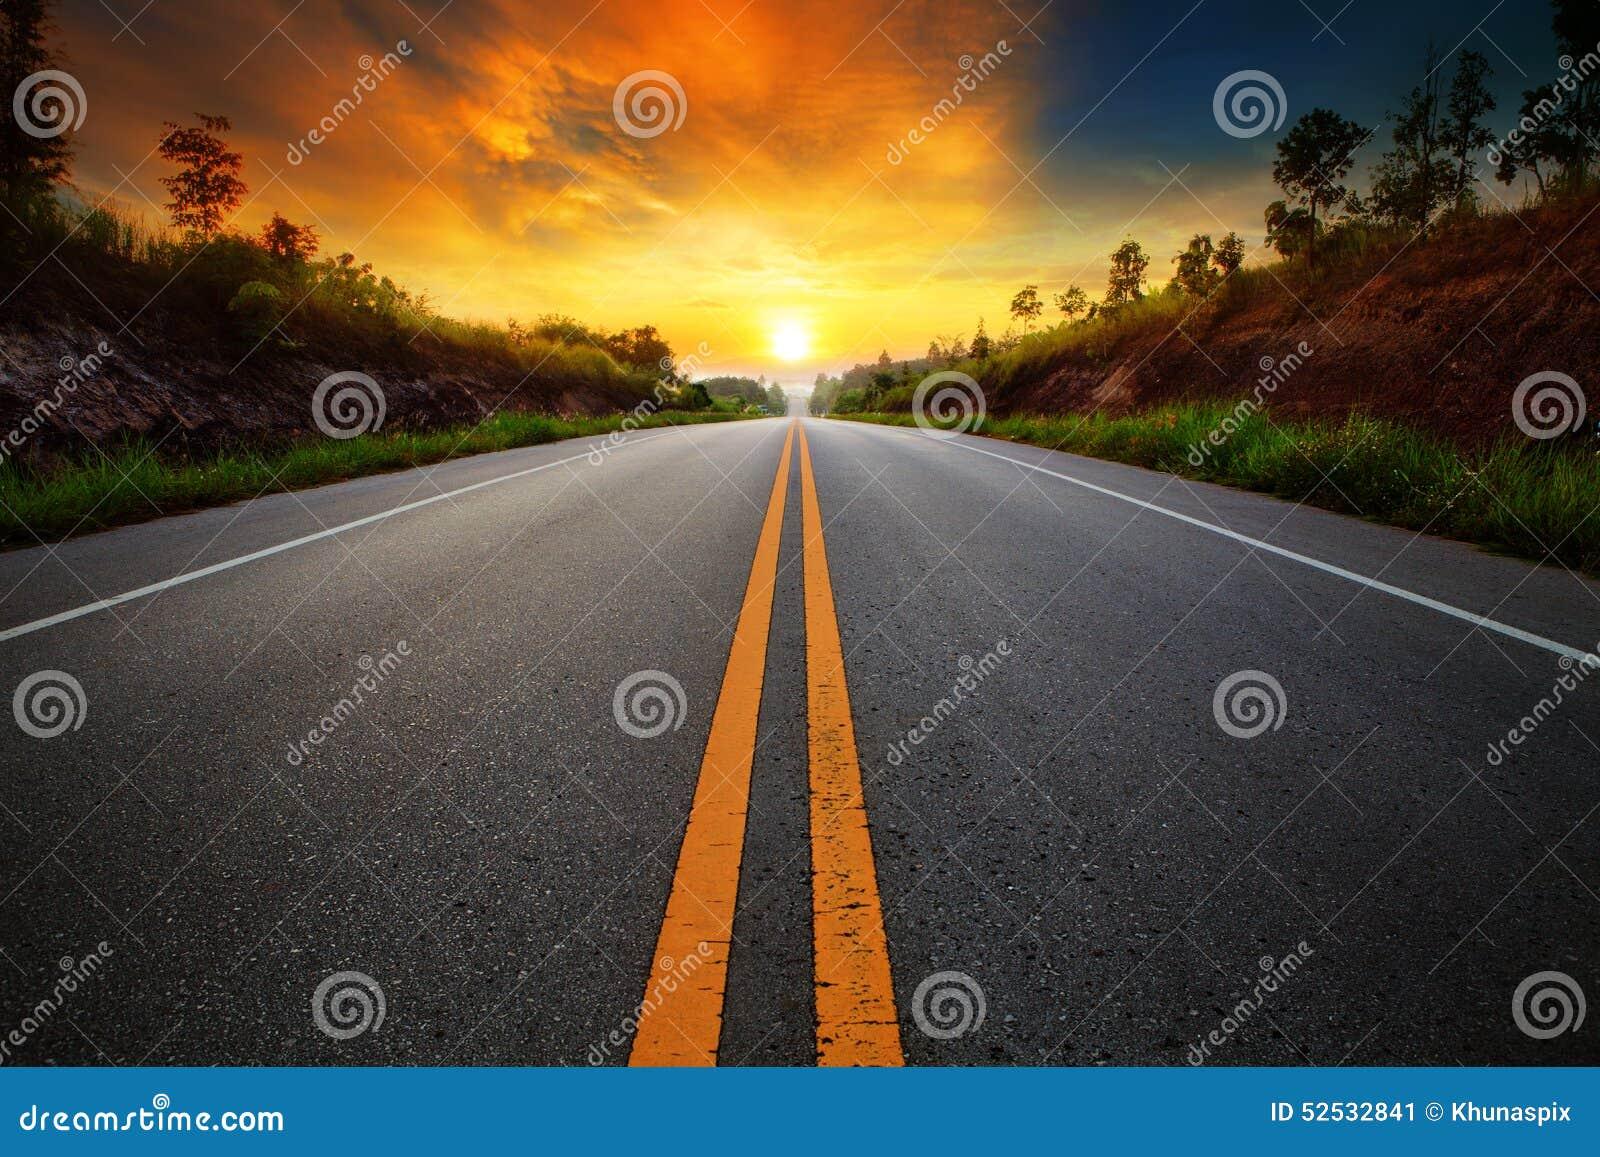 Beautiful sun rising sky with asphalt highways road in rural sce